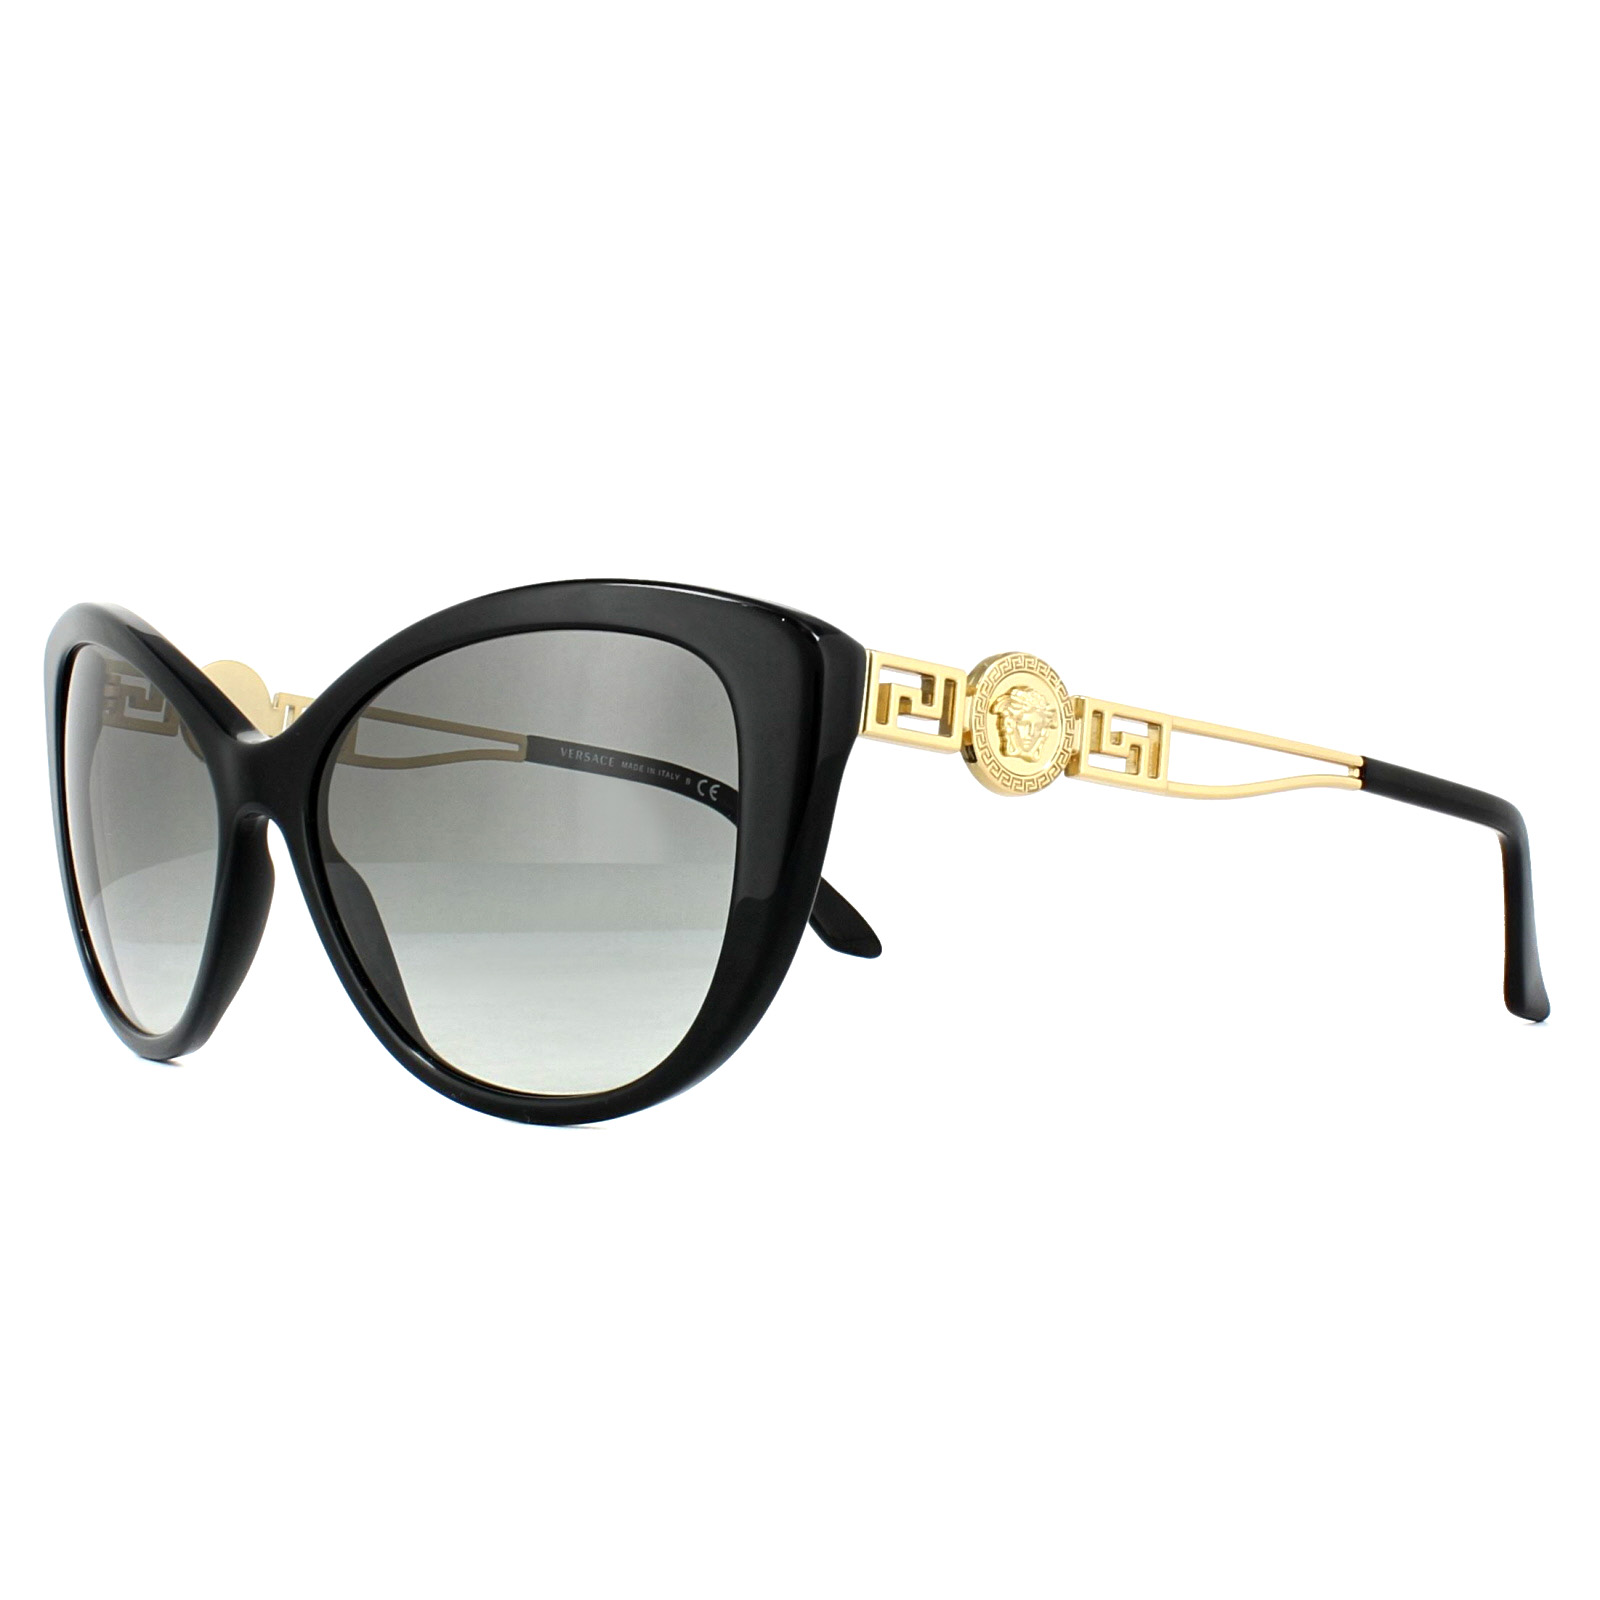 68b6519e138d Sentinel Versace Sunglasses VE4295 GB1 11 Black Grey Gradient